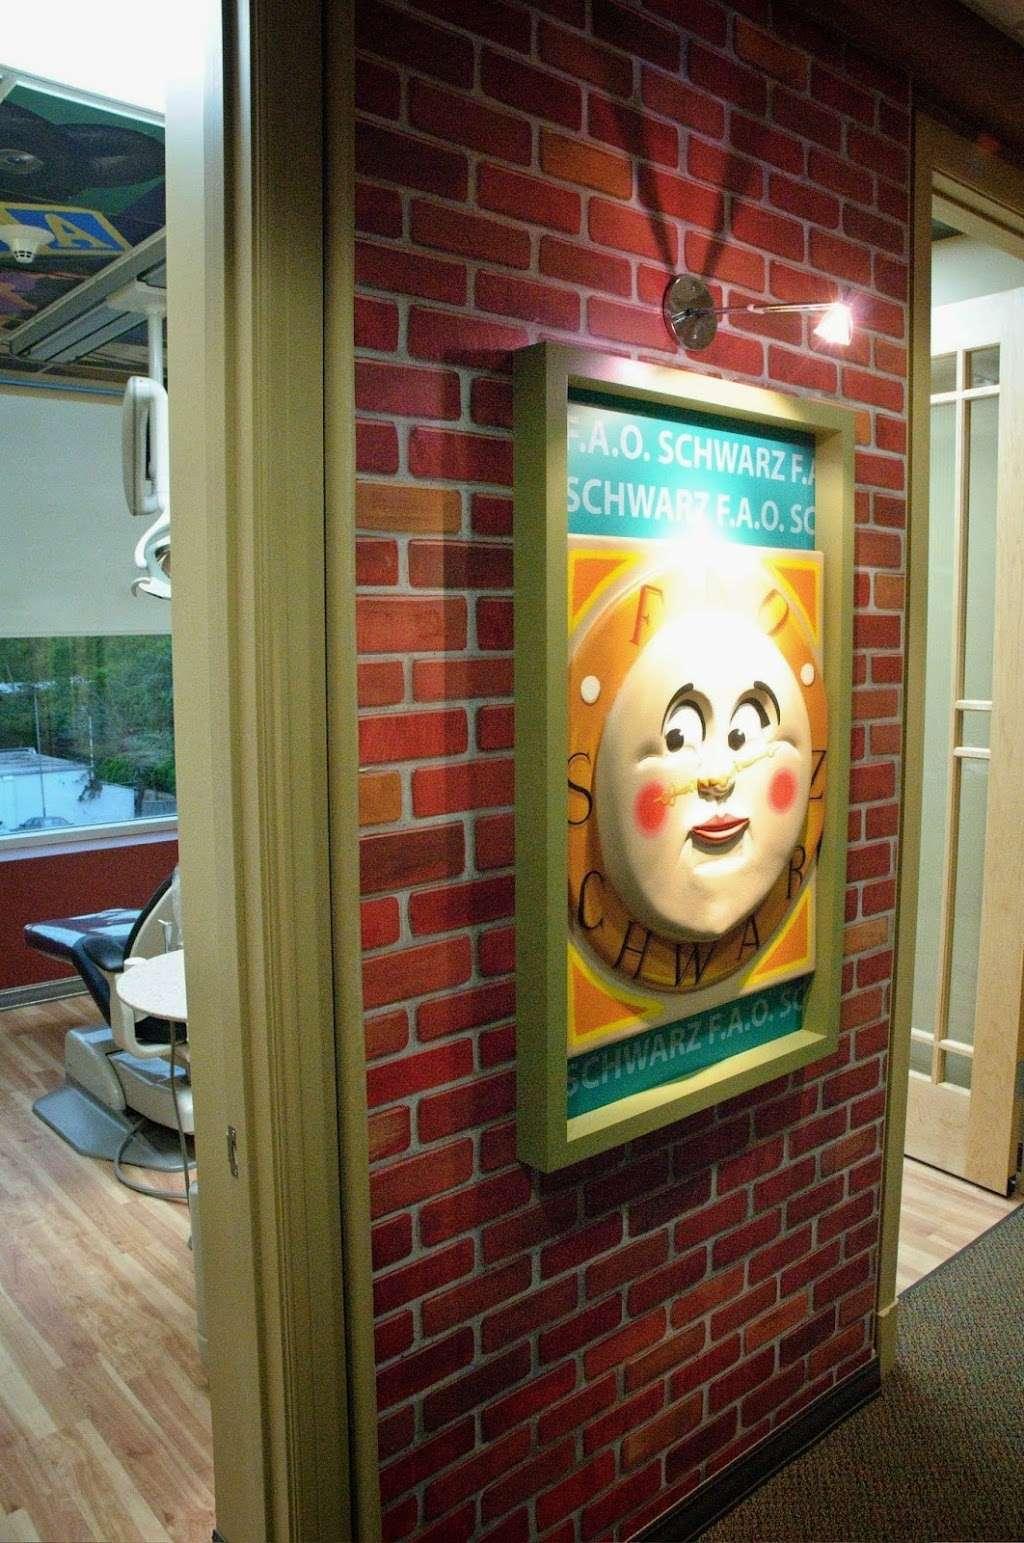 Kid Island Dental at Great Neck Dental Associates - dentist  | Photo 7 of 8 | Address: 611 Northern Blvd #100, Great Neck, NY 11021, USA | Phone: (516) 487-5500